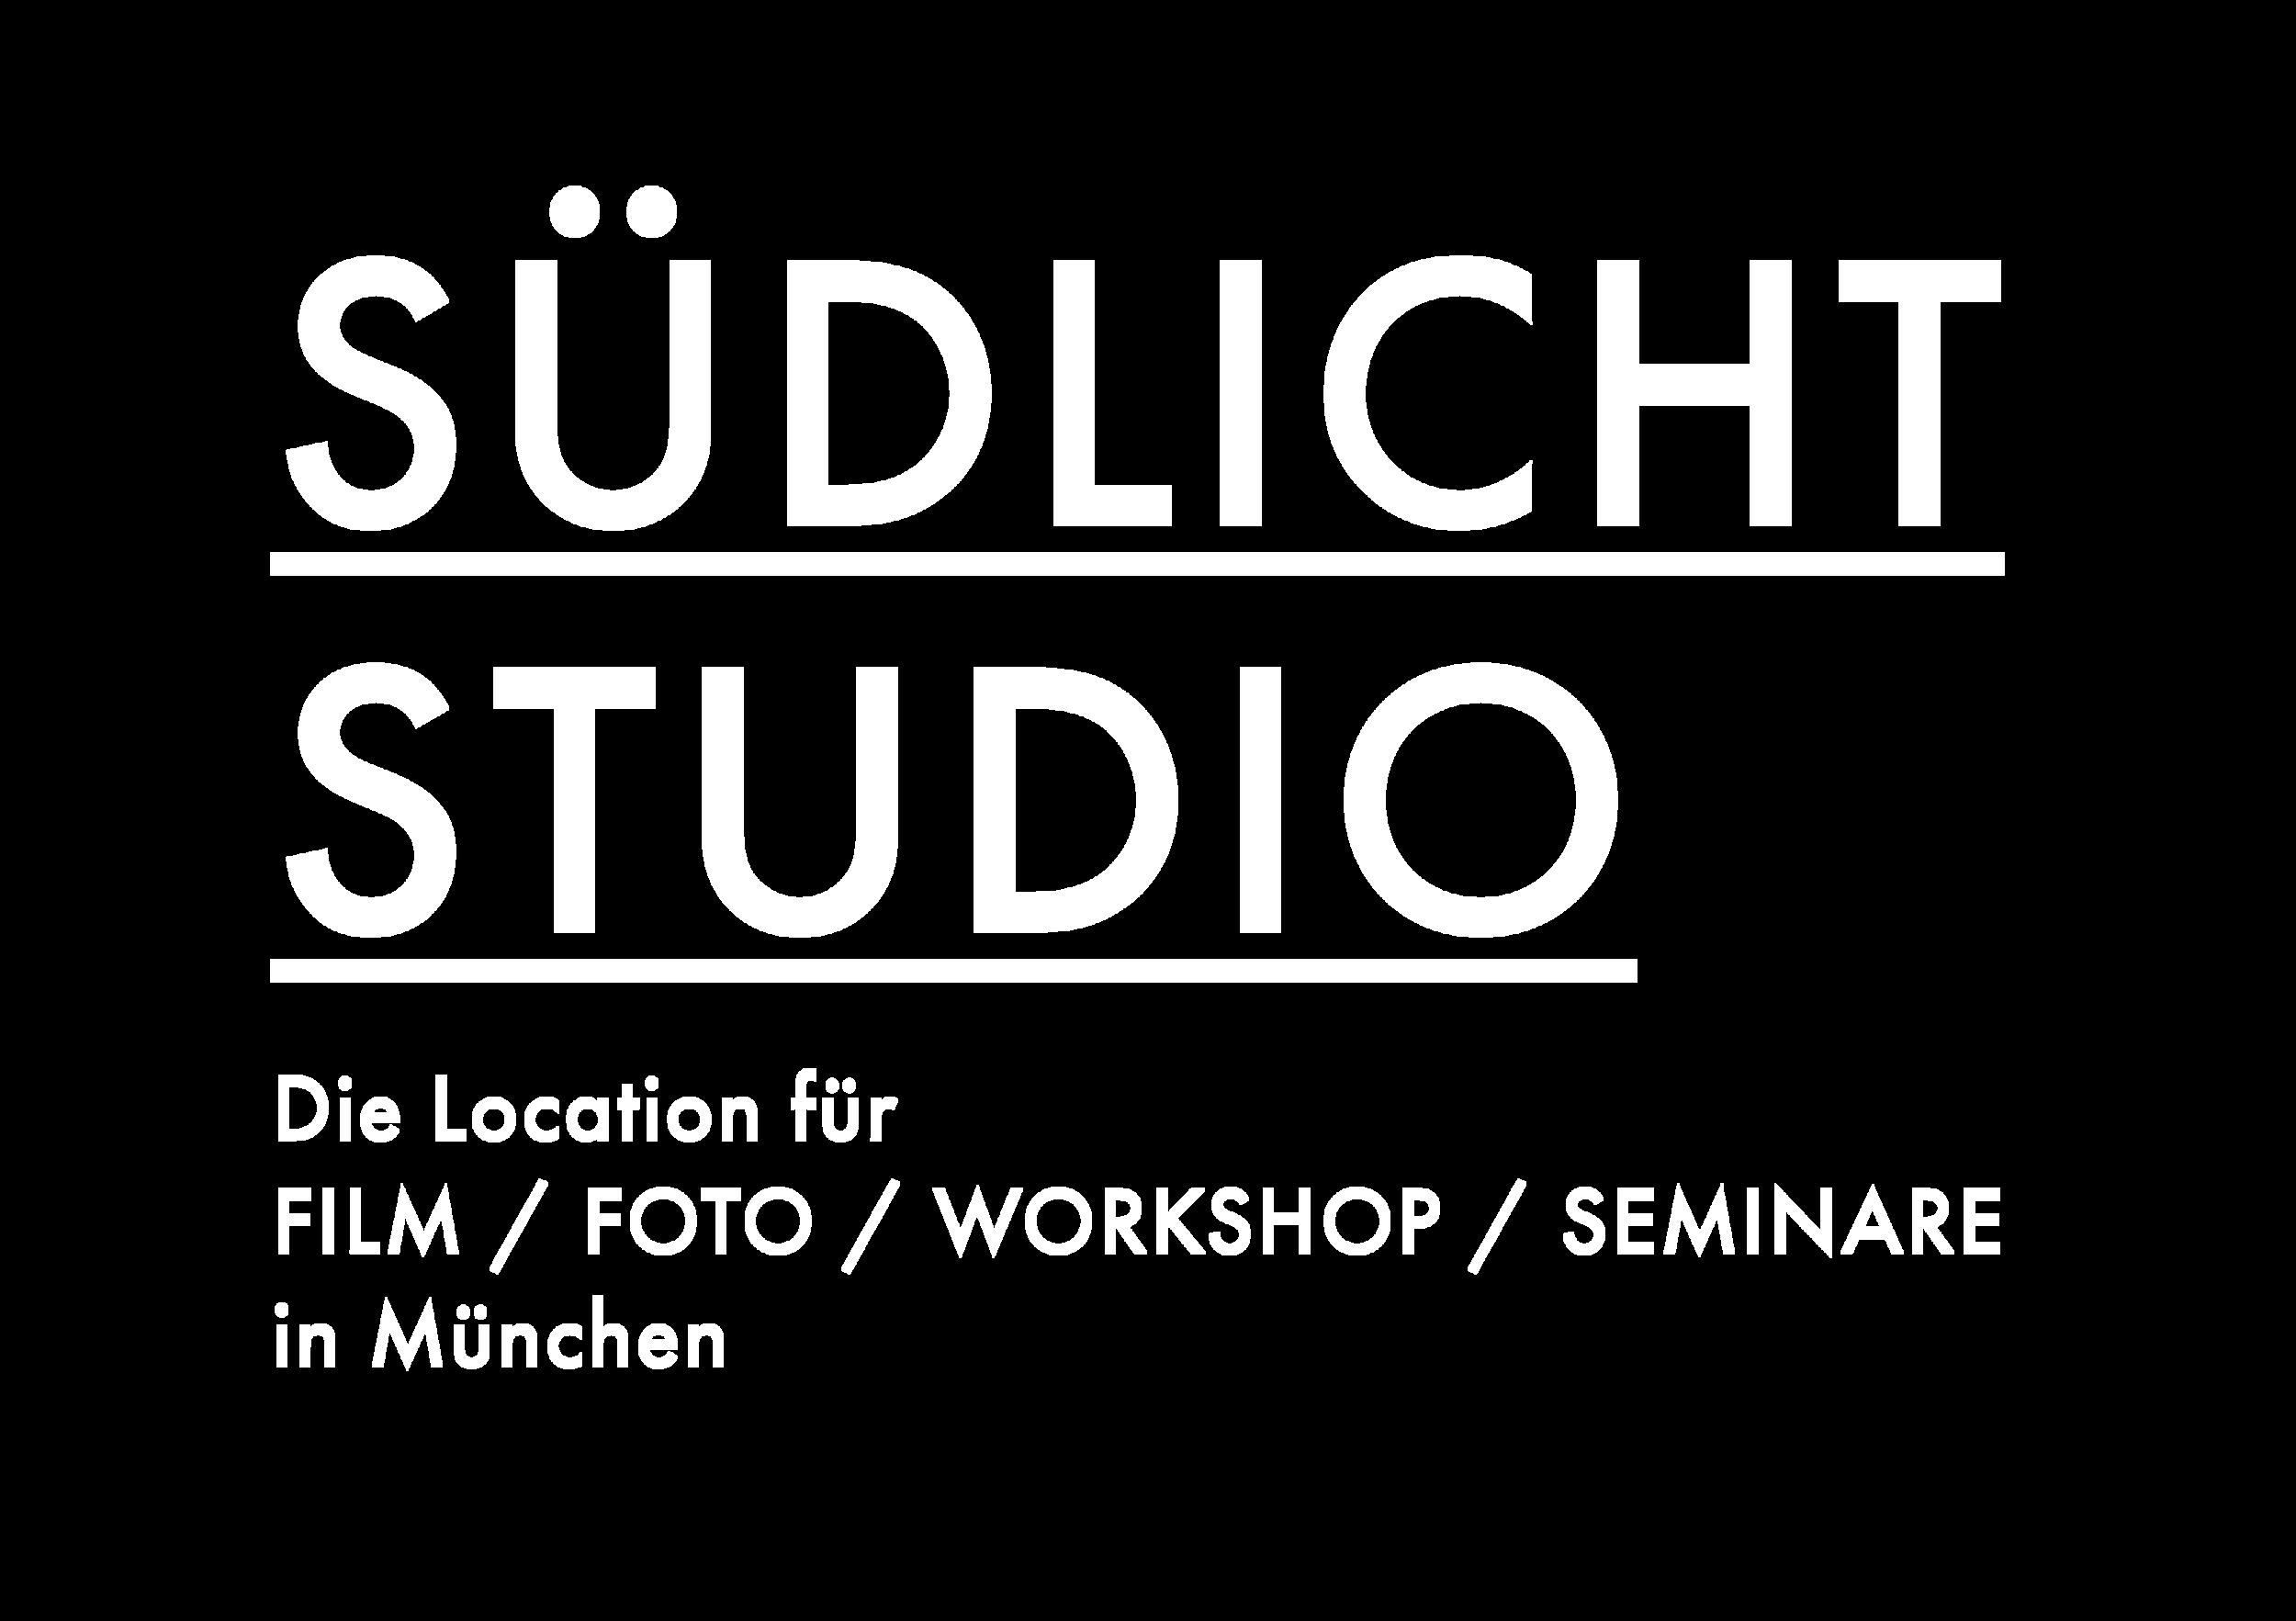 SÜDLICHT STUDIO LOGO WEB 1.png